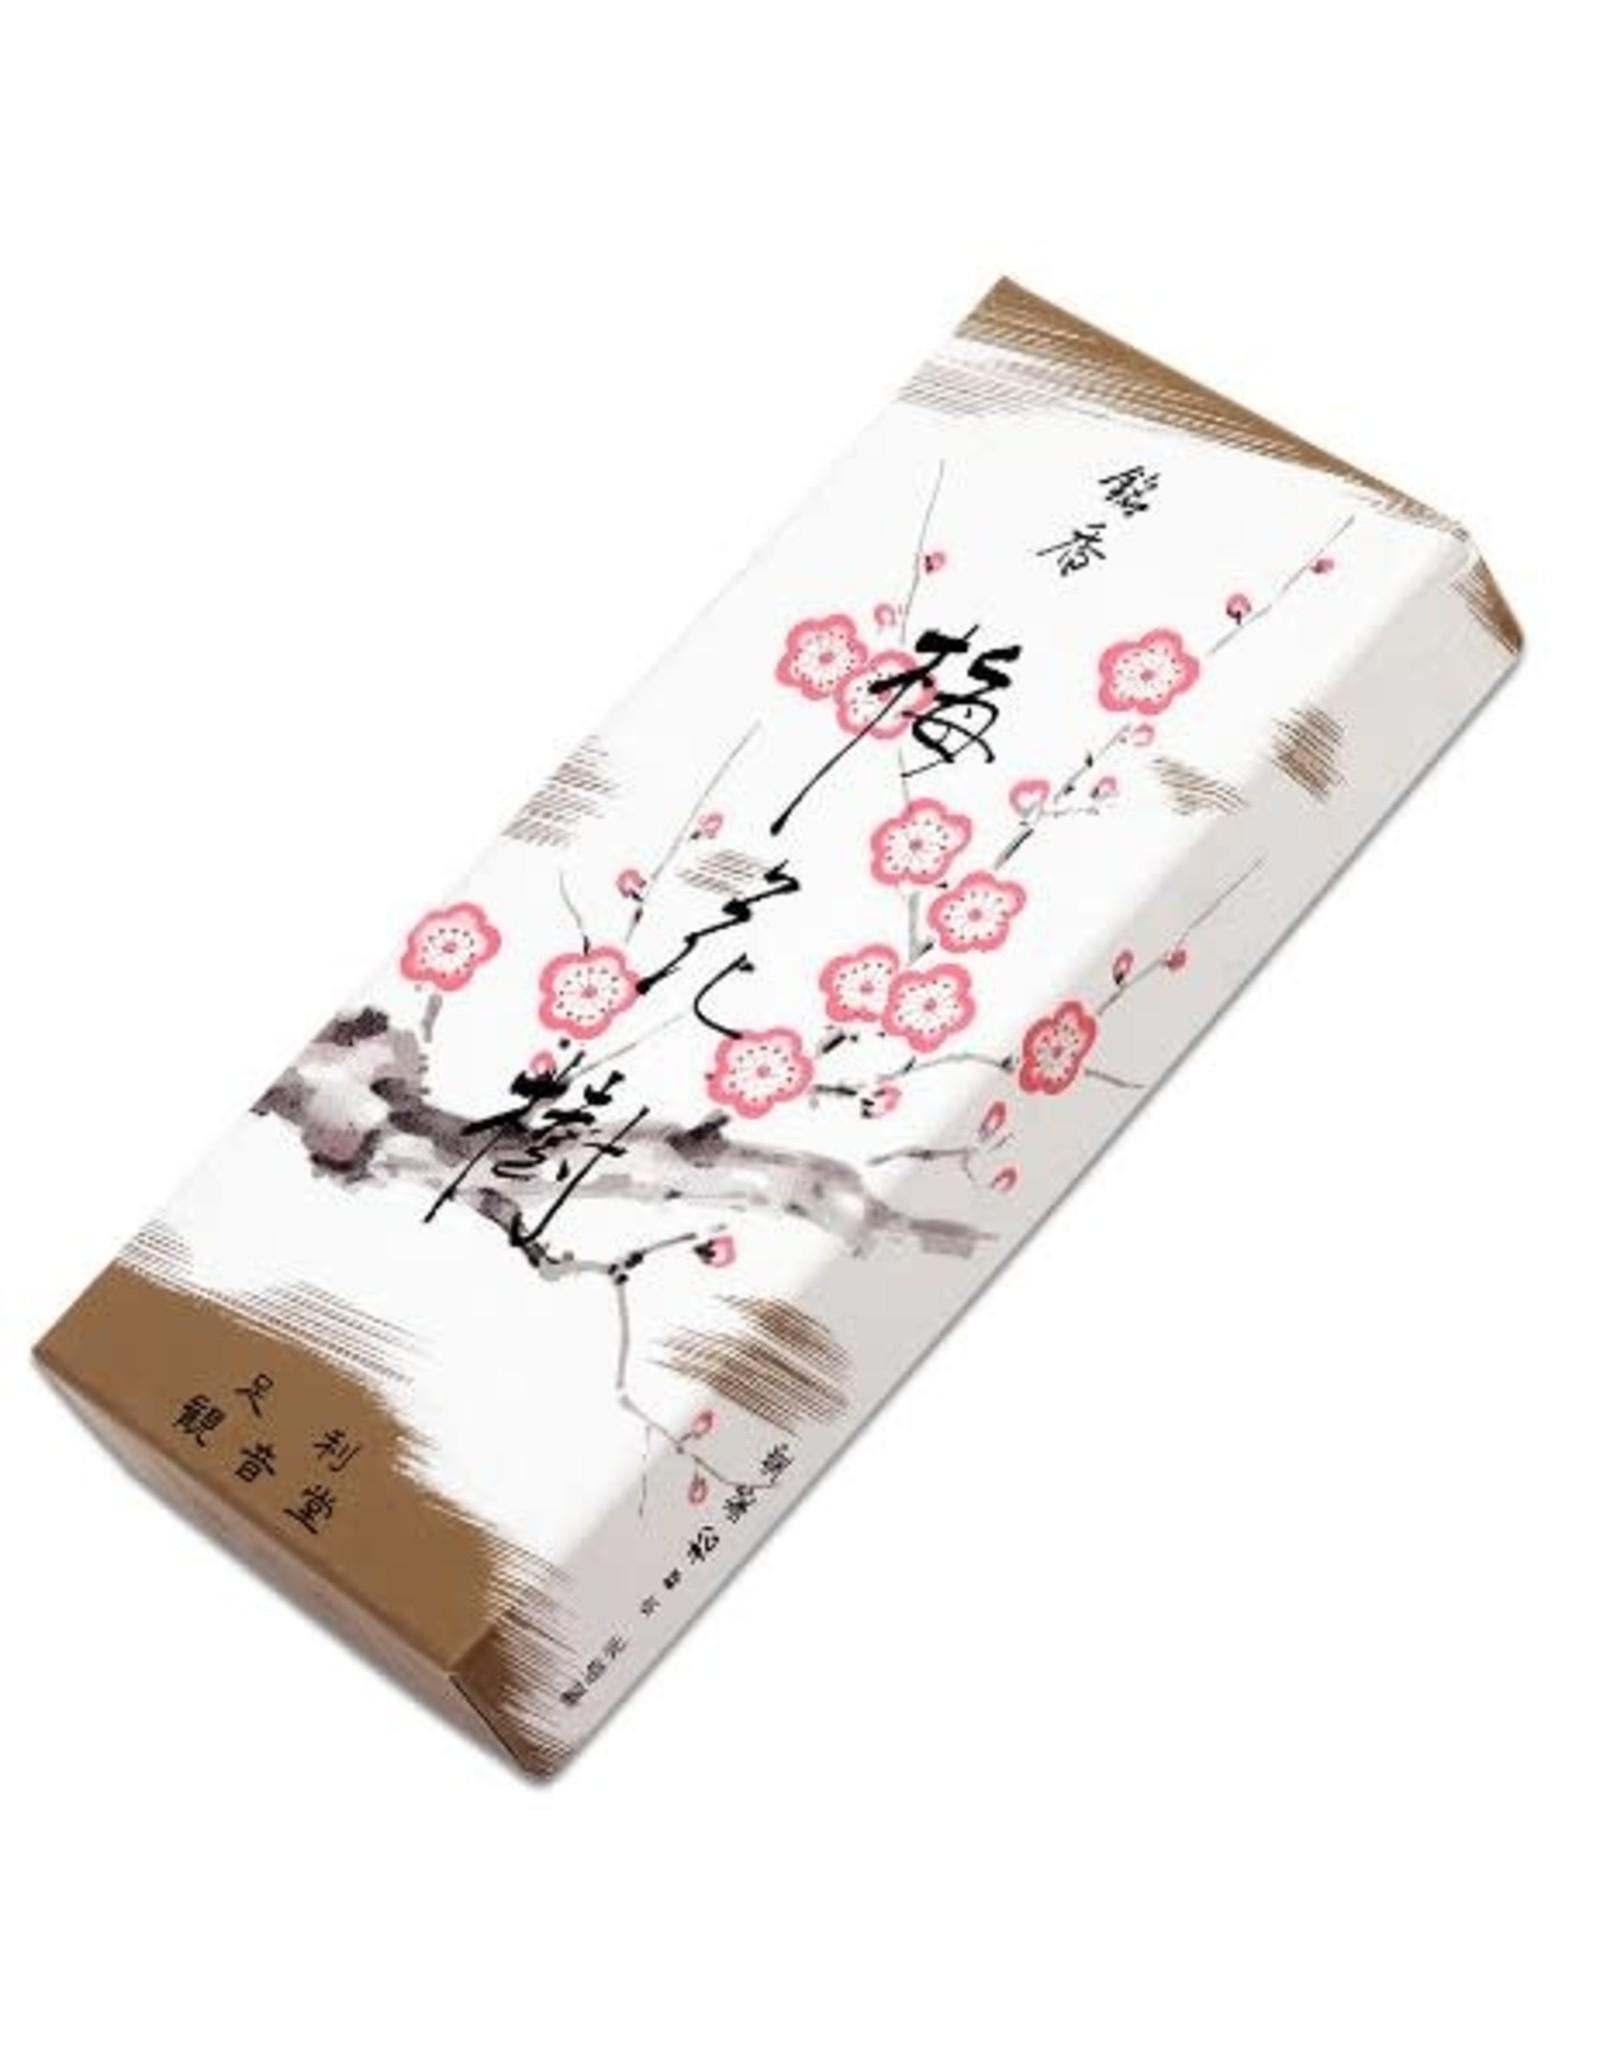 Shoyeido Plum Blossoms Baika-ju Box/150